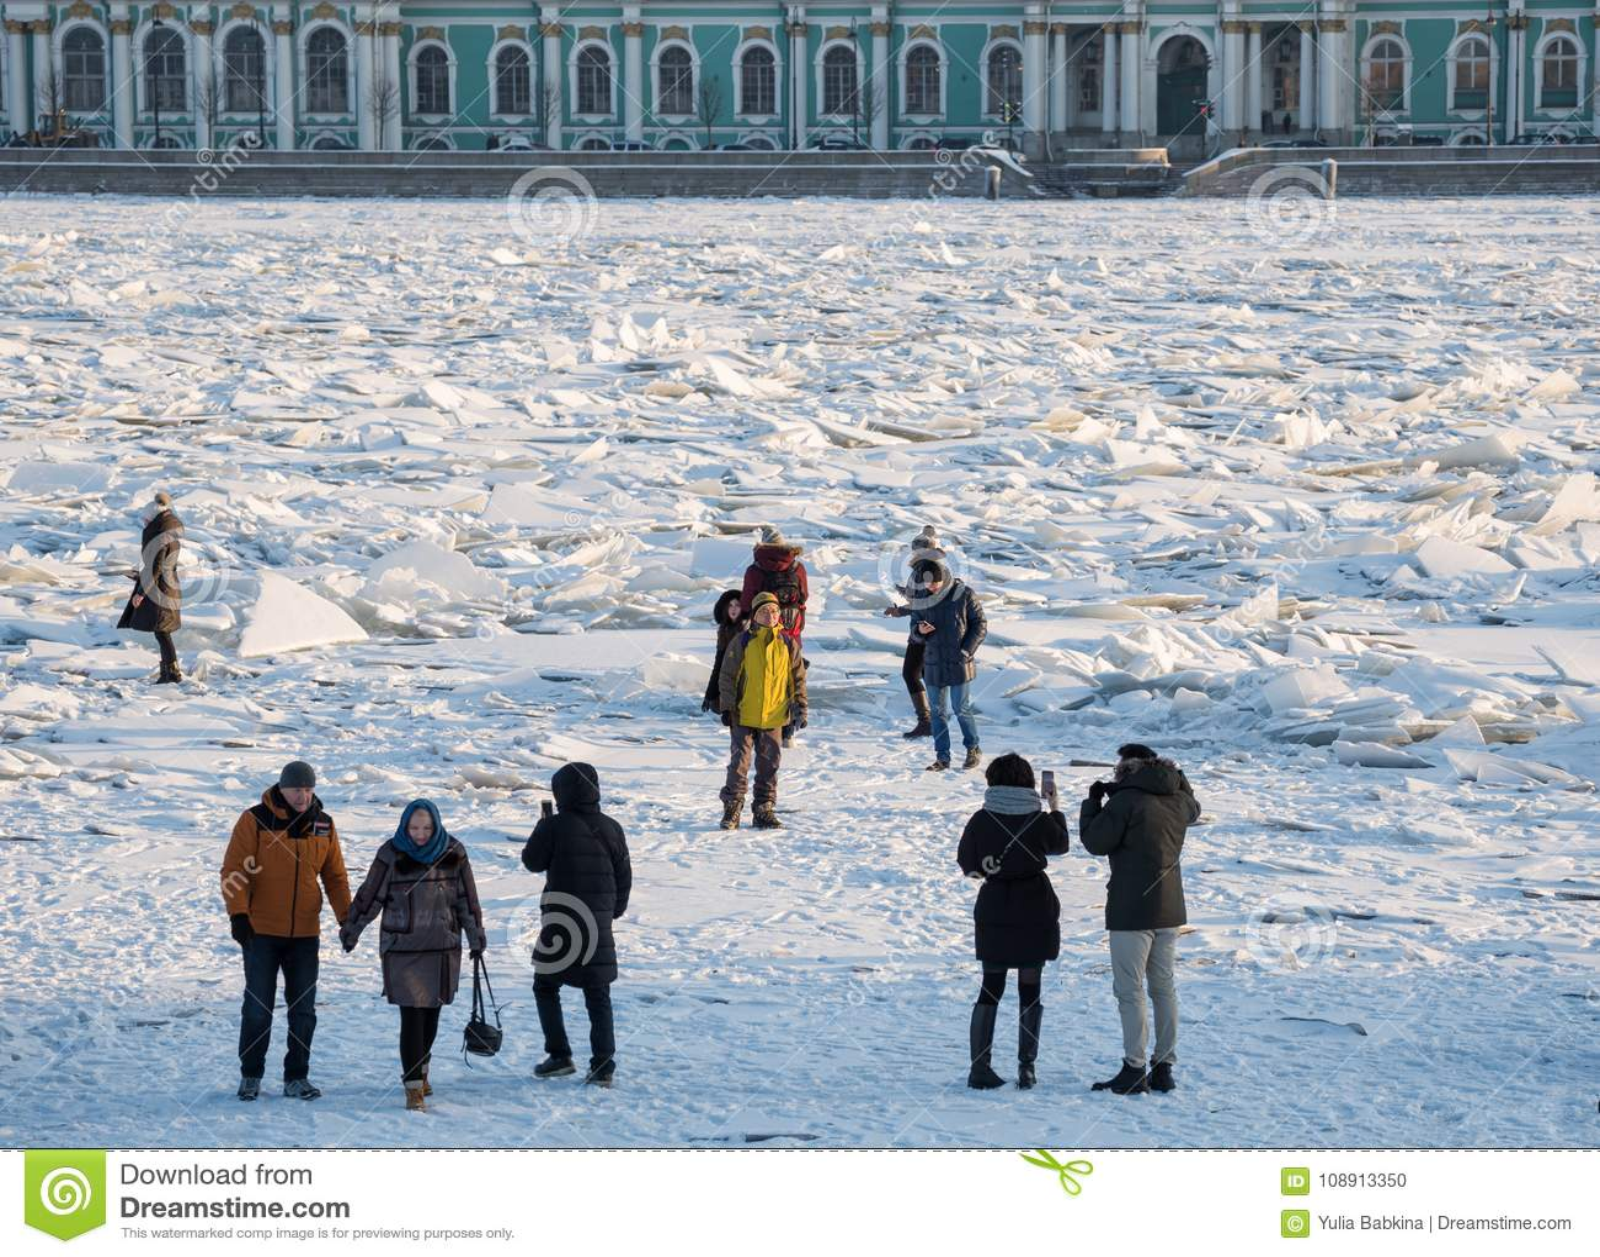 Morones en Neva River